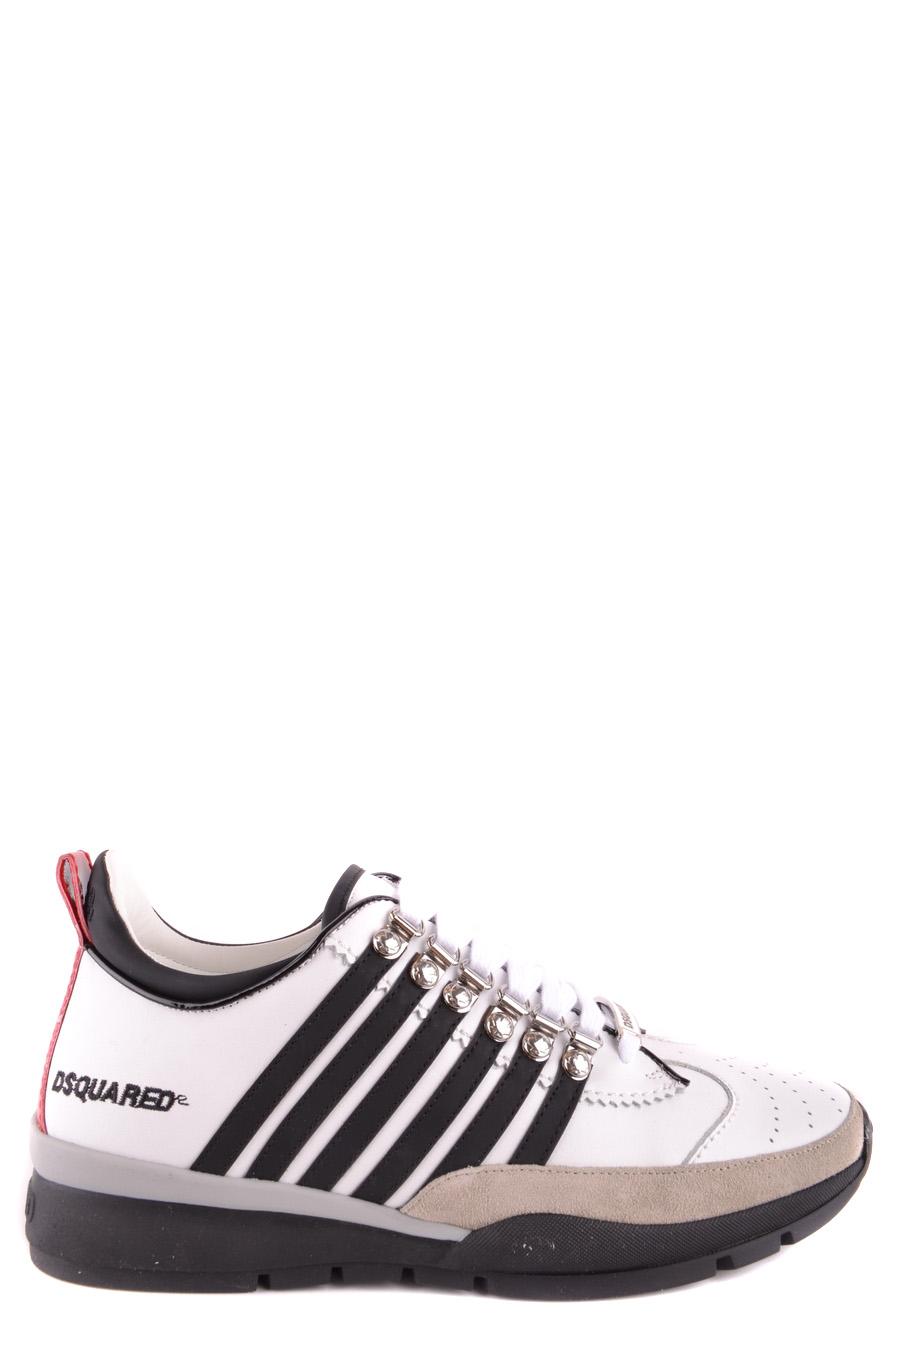 eecb3426b27760 DSQUARED2 Shoes